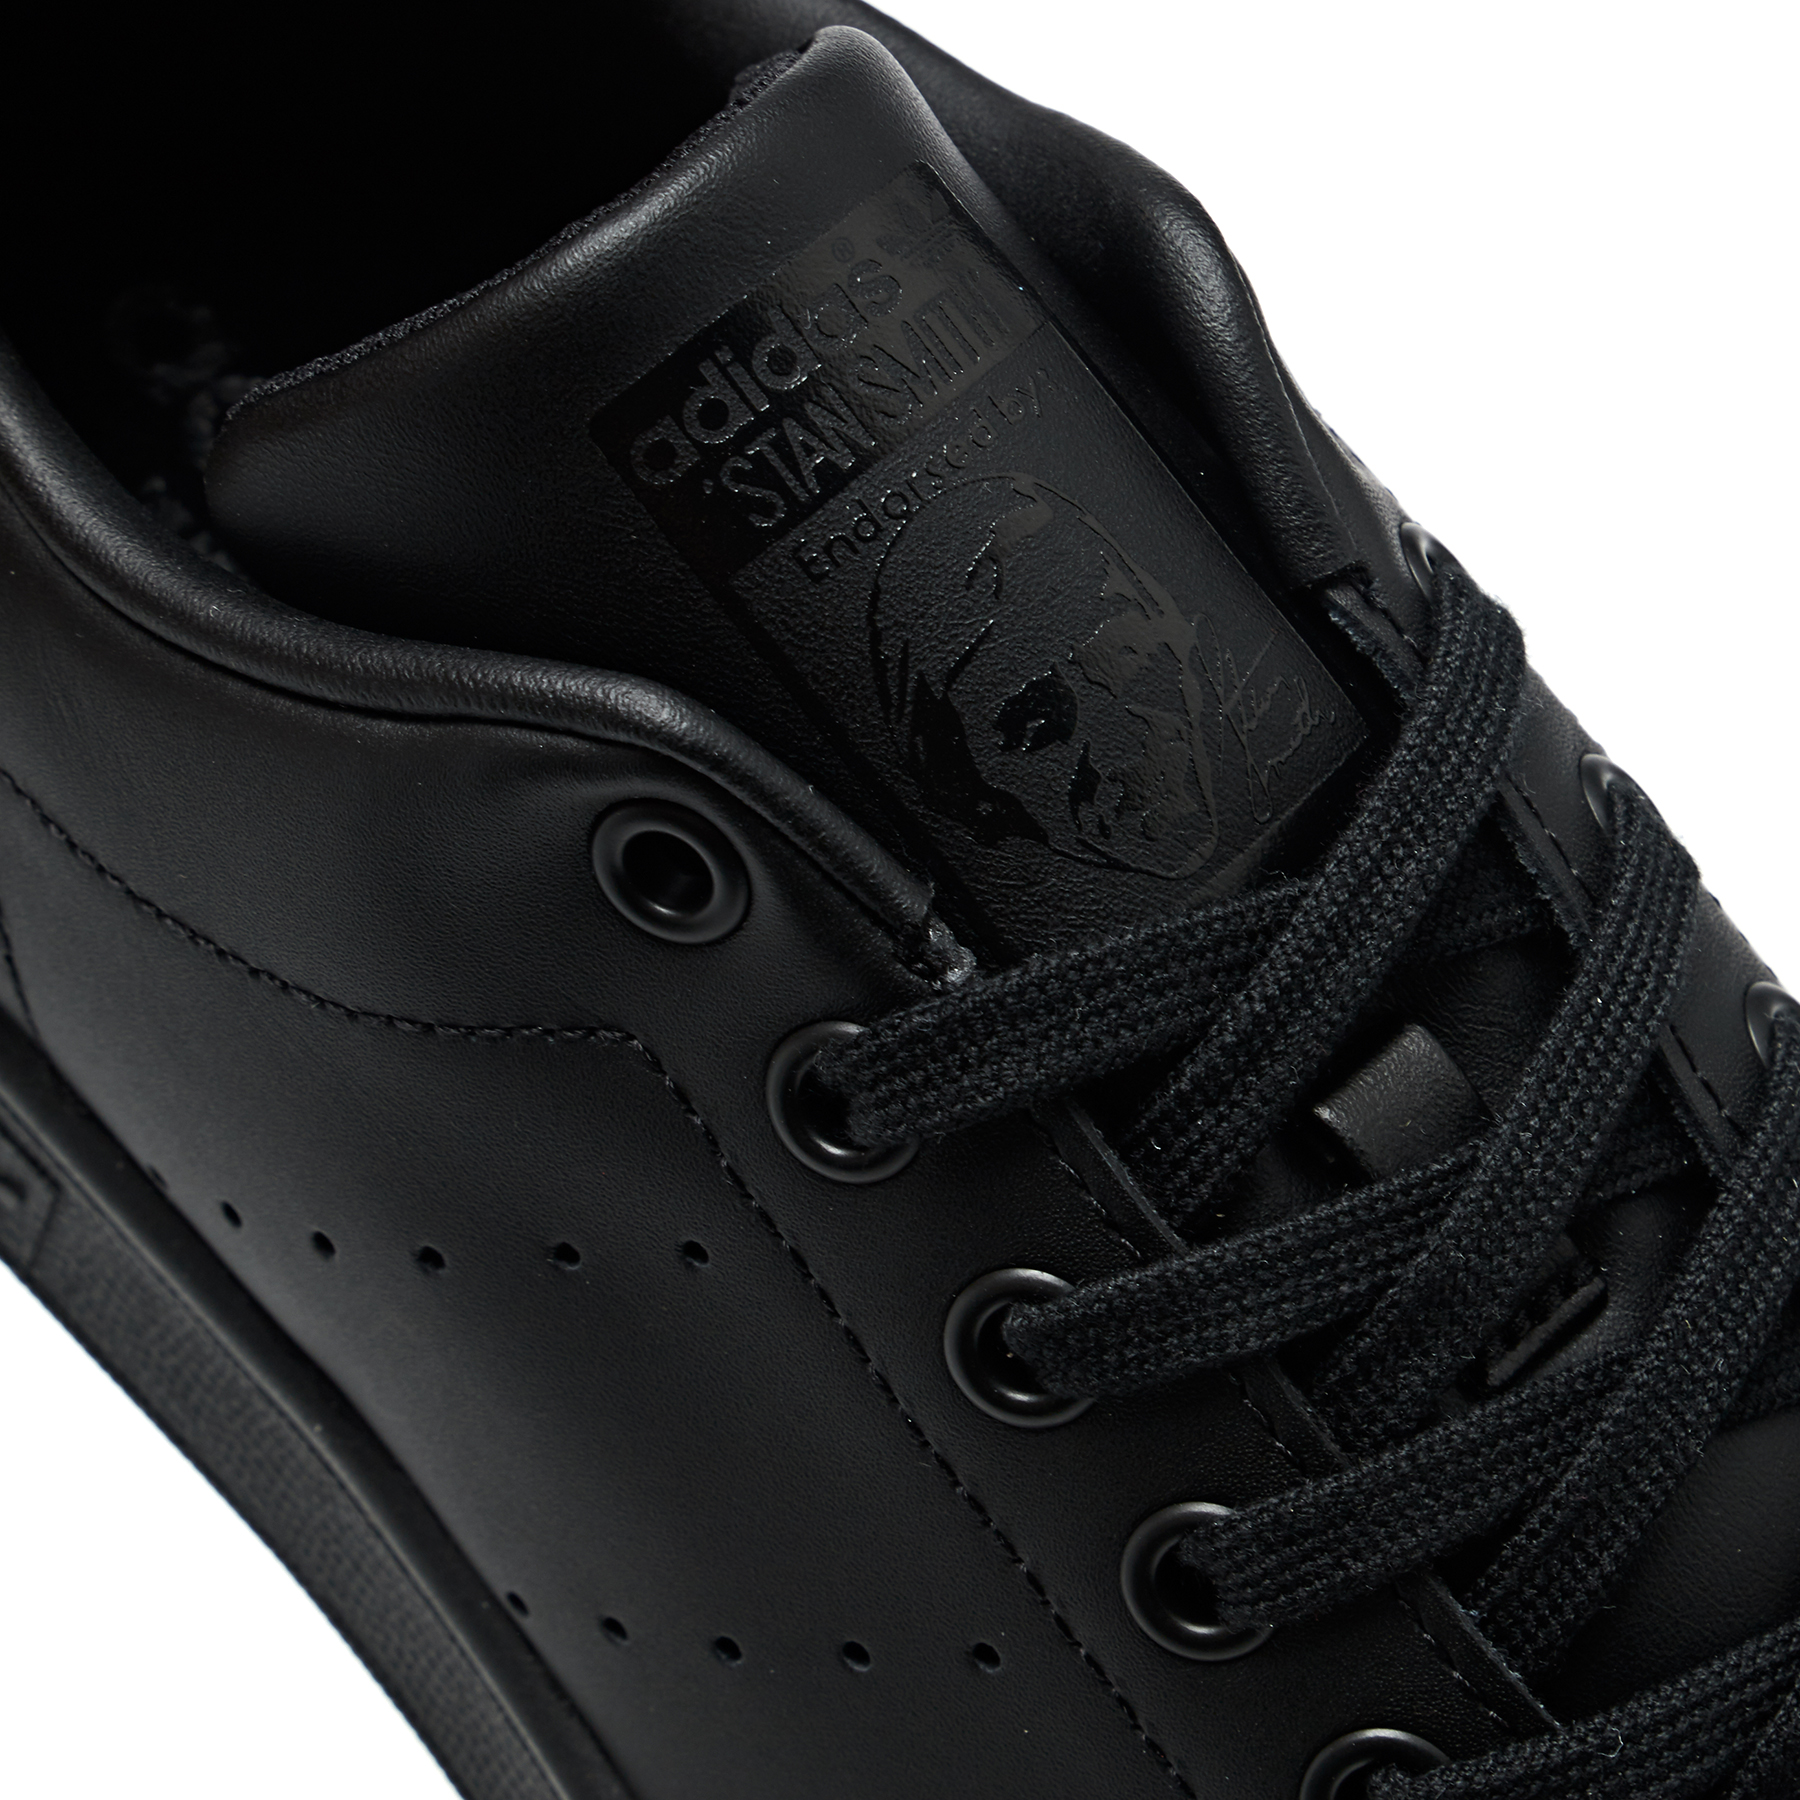 Chaussures Adidas Originals Stan Smith | Livraison gratuite